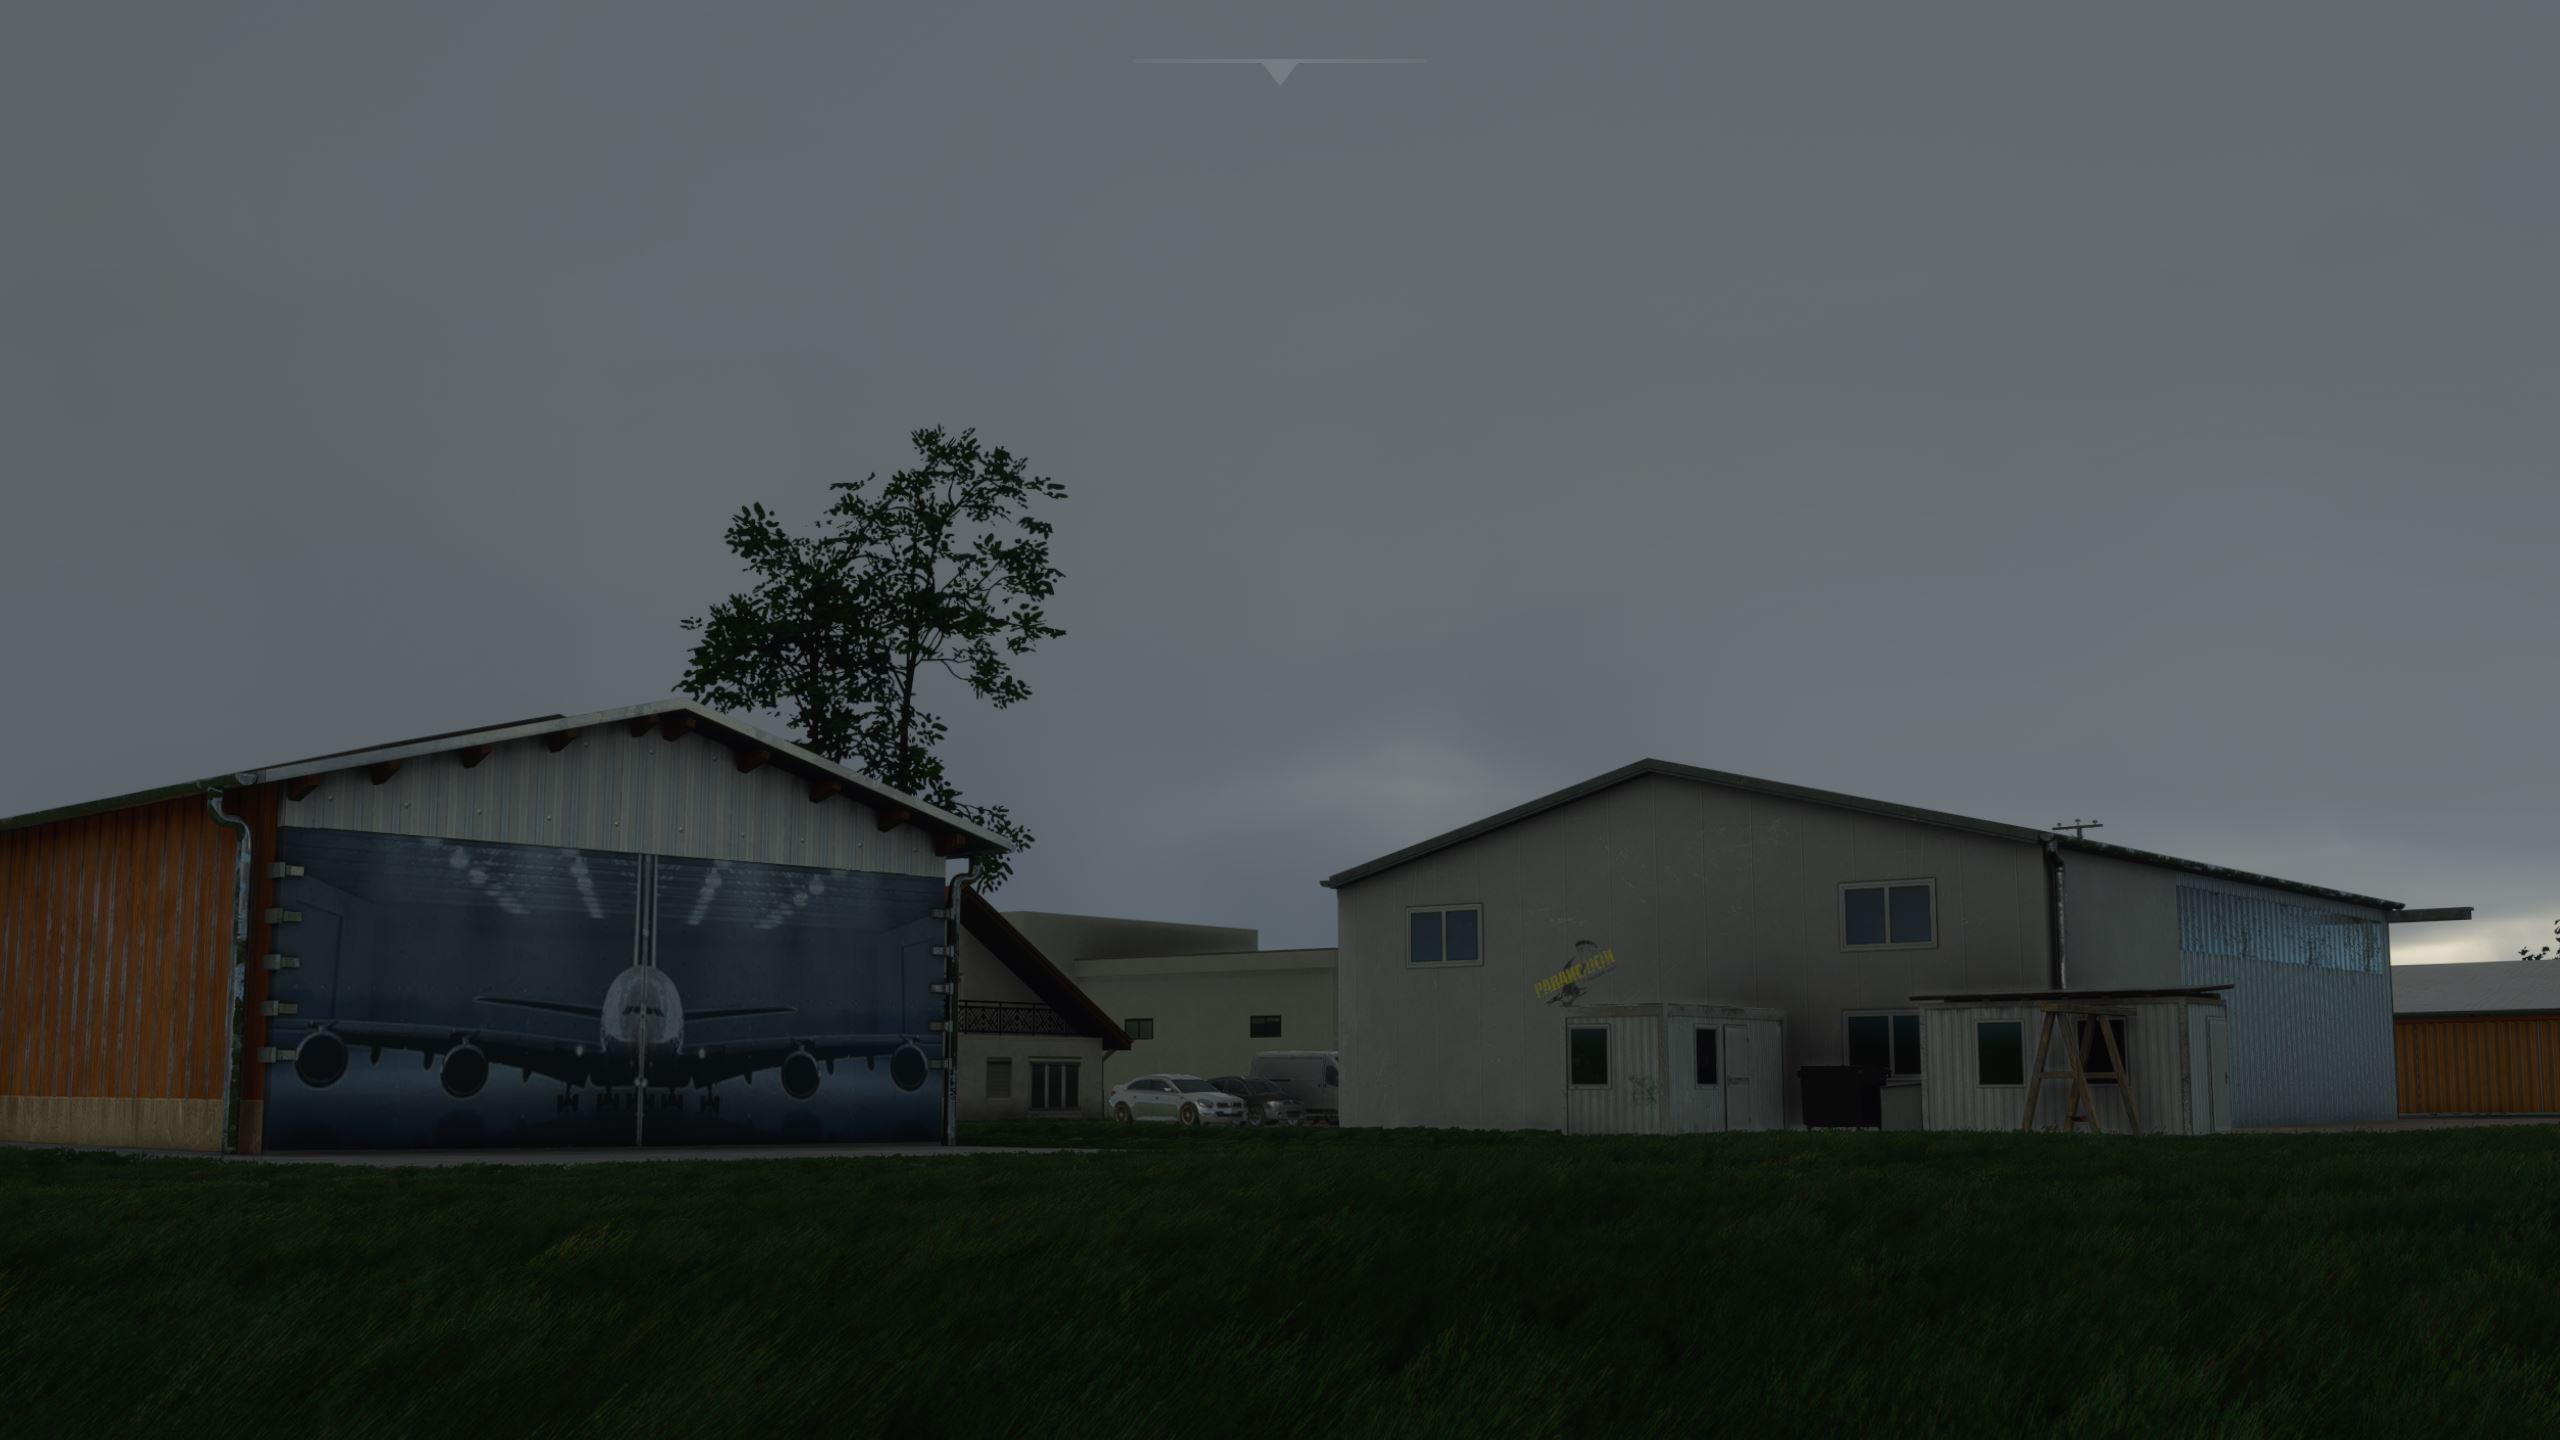 EDMI-Preview-14.JPG